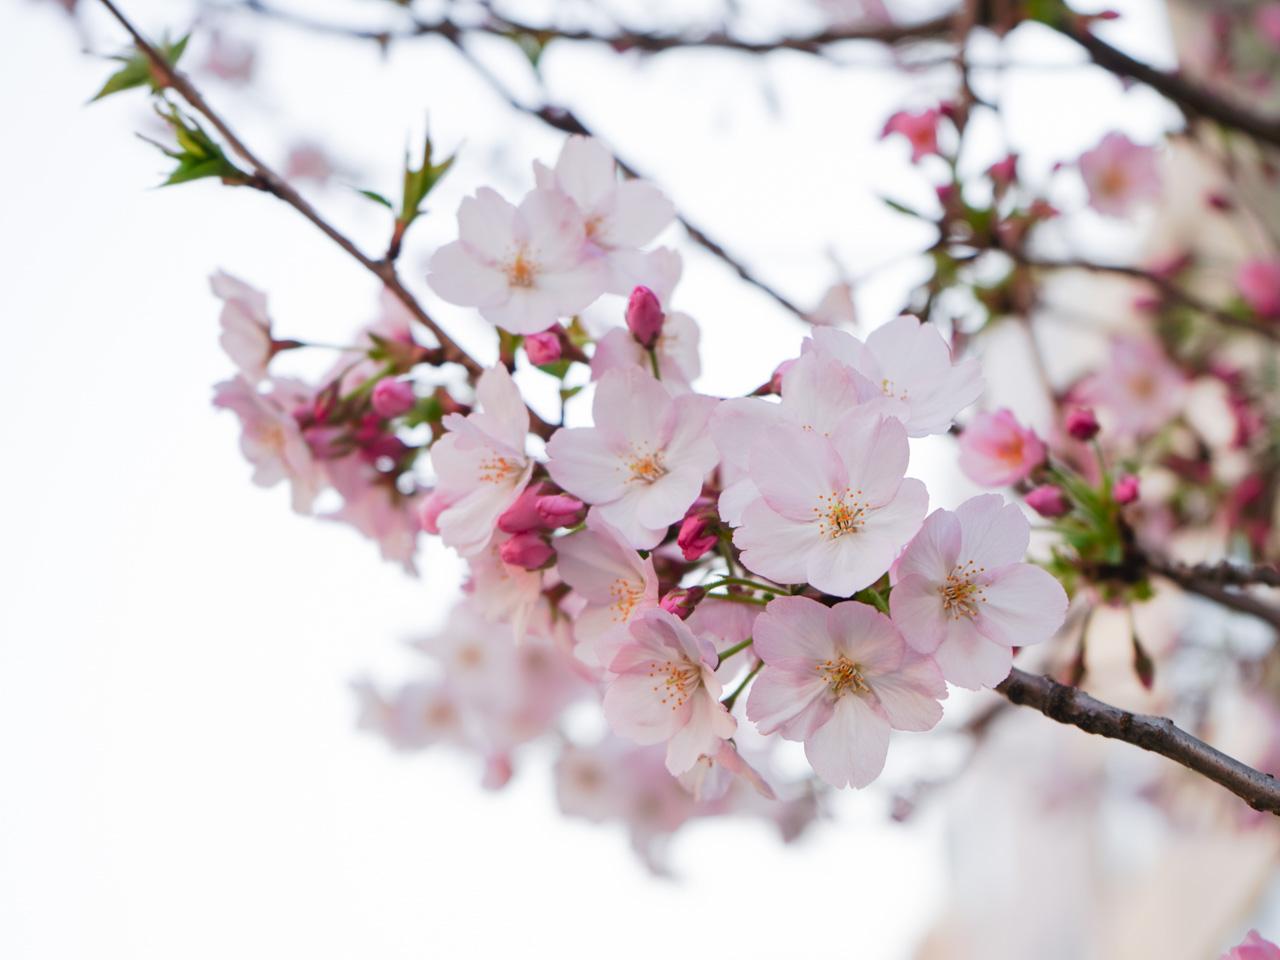 5/9 TOKYO MX1 週末ハッピーライフ!お江戸に恋して